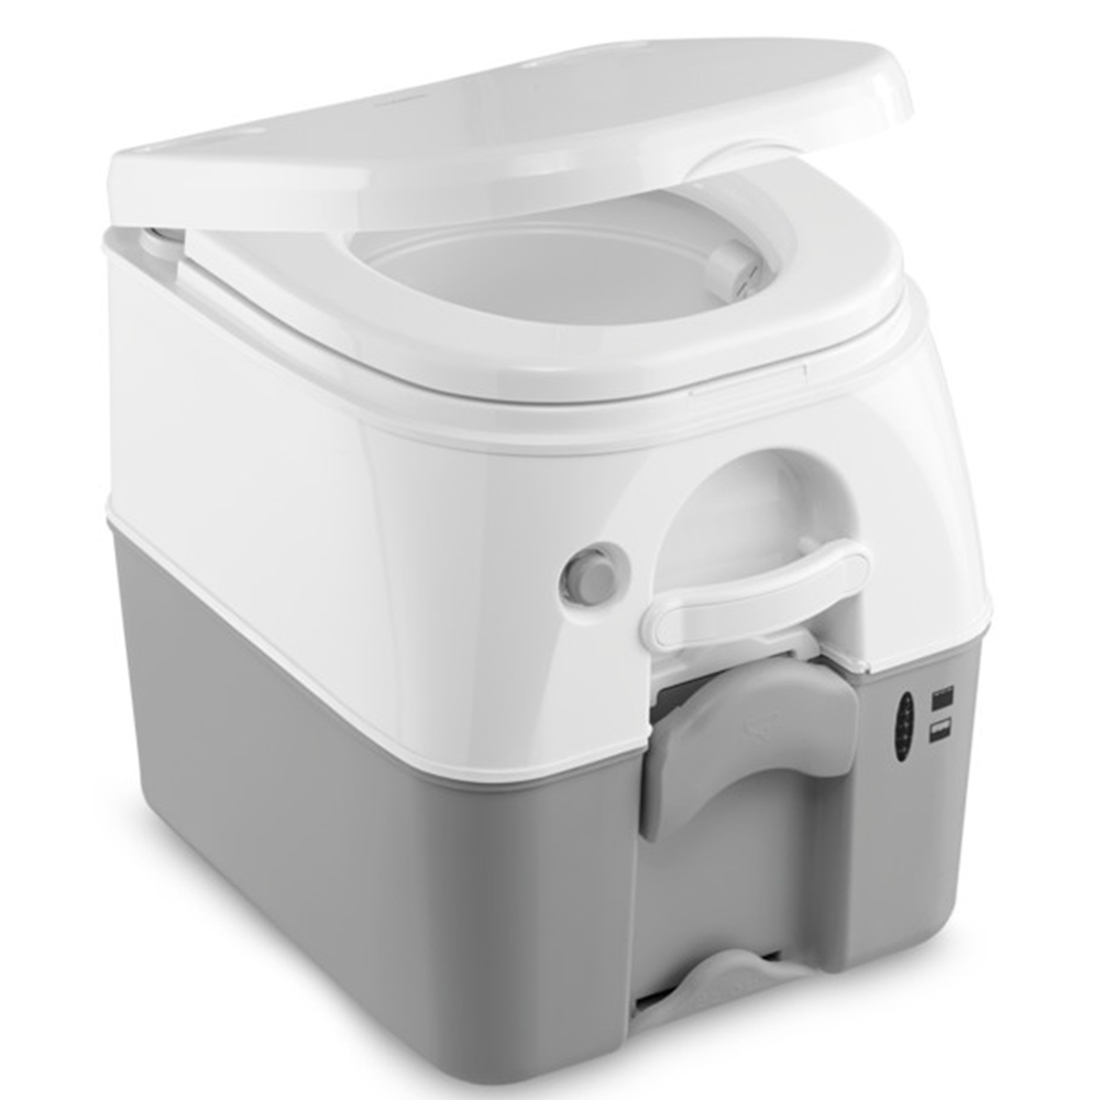 Dometic 976 Large Portable Toilet